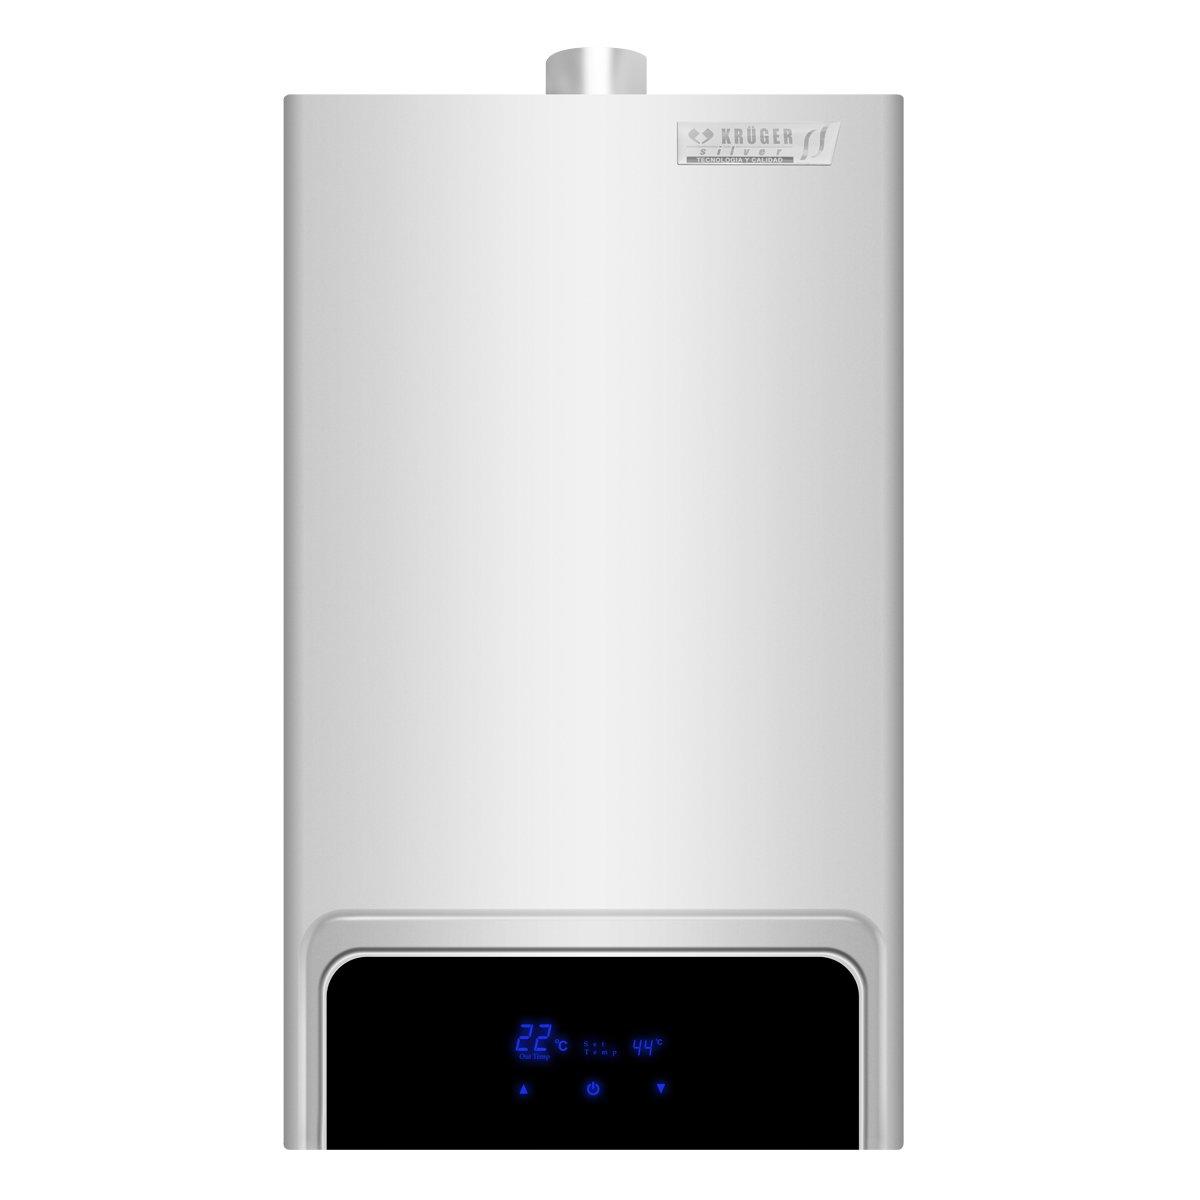 Calentador instant neo kr ger silver 16 gas natural - Calentador gas natural precio ...